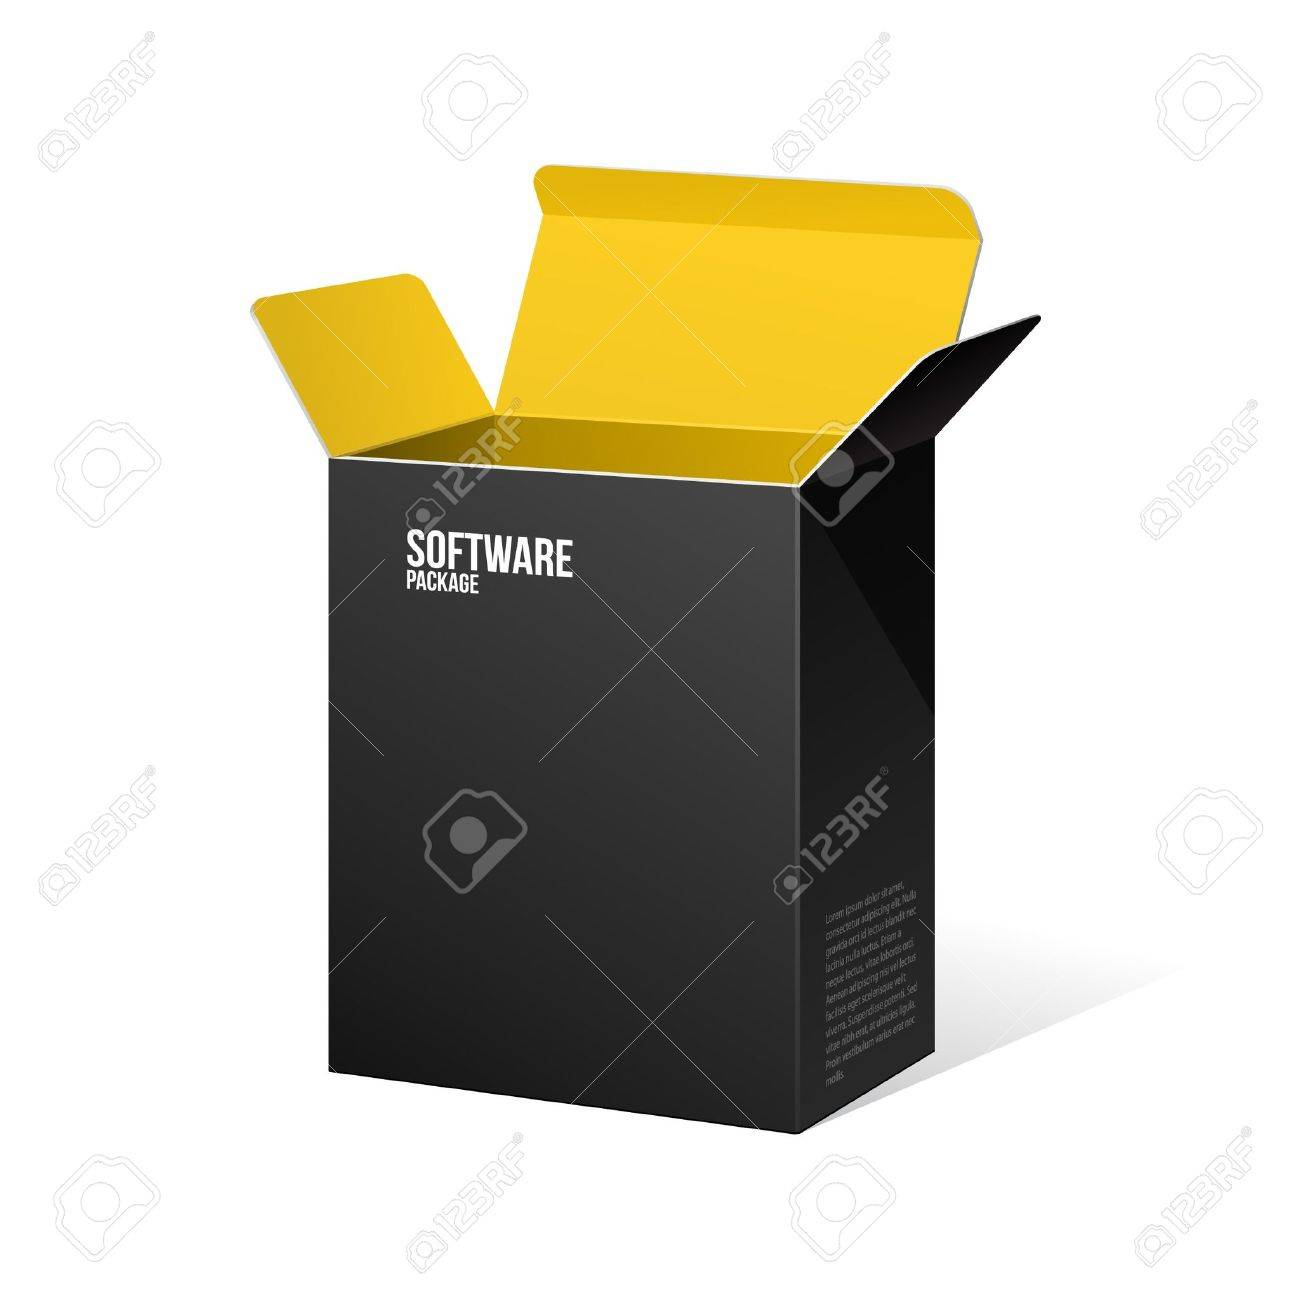 Software Package Box Opened Black Inside Yellow Orange - 13764911